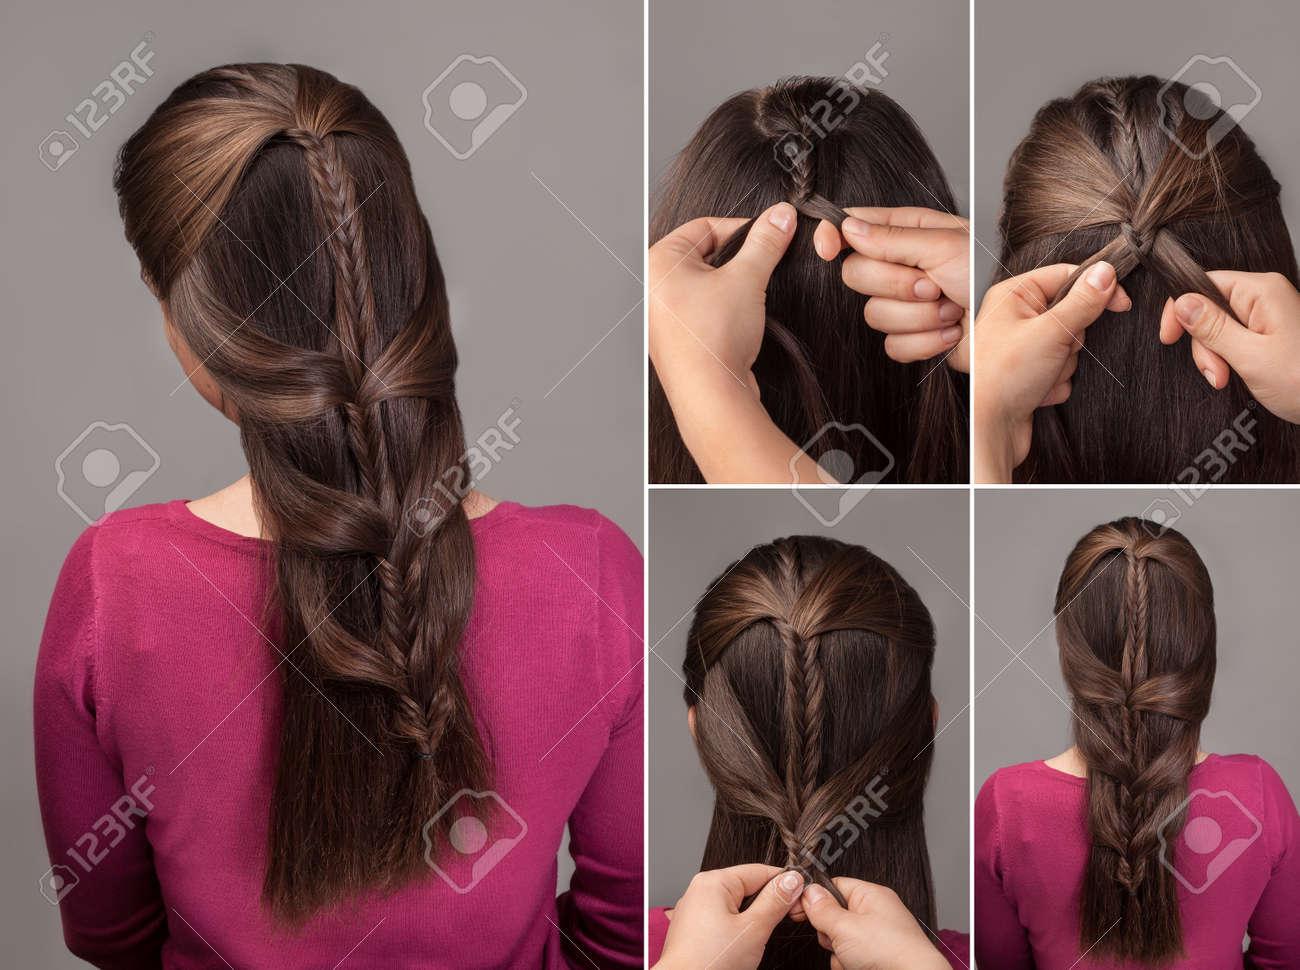 Fishtail Braid Tutorial Method Of French Braid Process Of Weaving